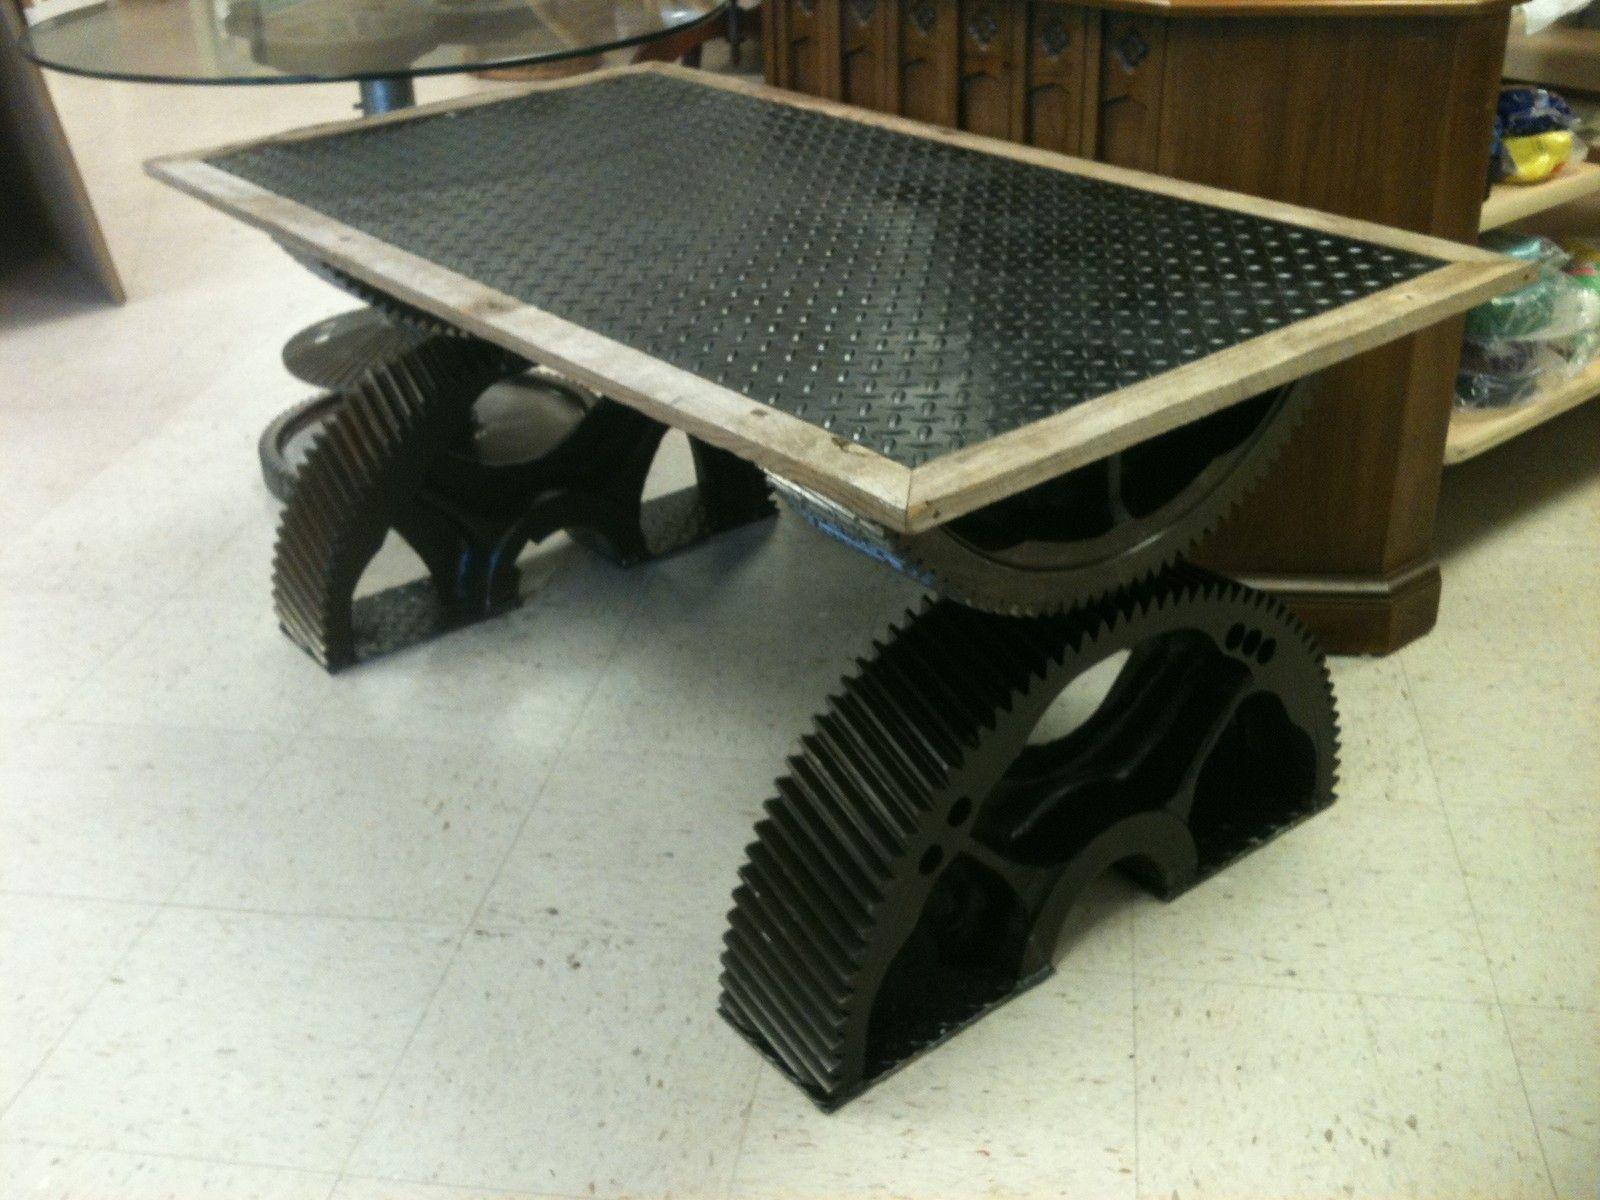 Steampunk Gear Coffee Table | EBay $1000